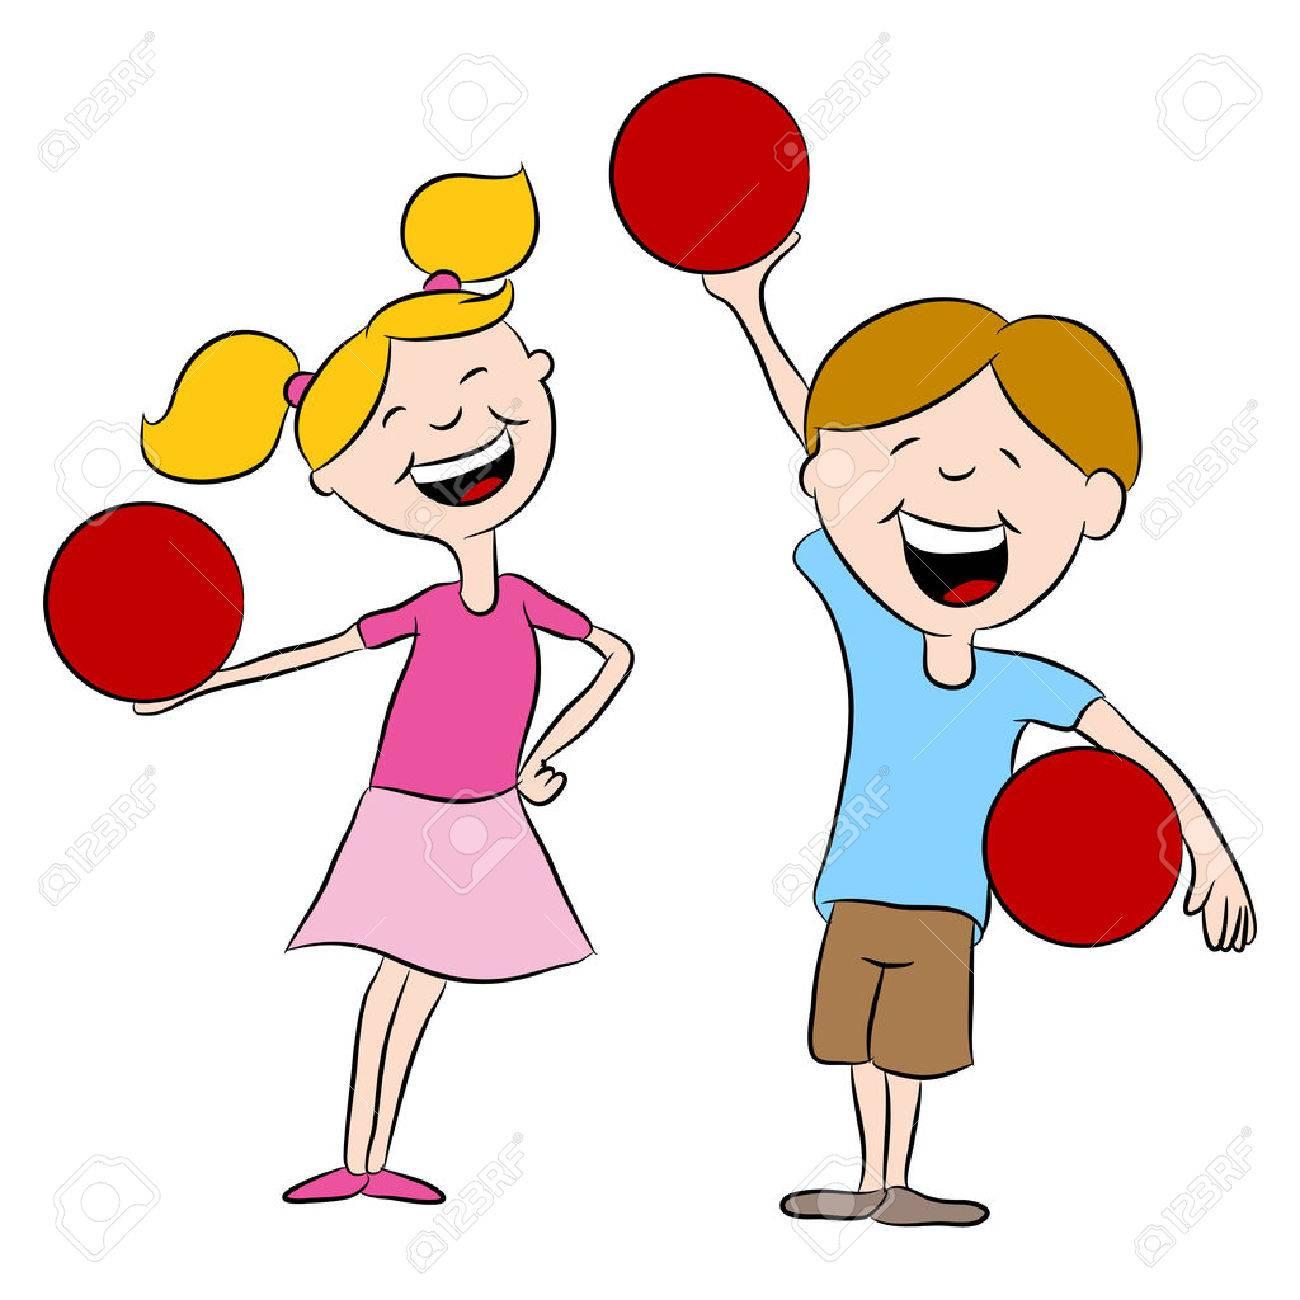 cartoon kids playing dodgeball royalty free cliparts vectors and rh 123rf com dodgeball images clipart Dodgeball Art